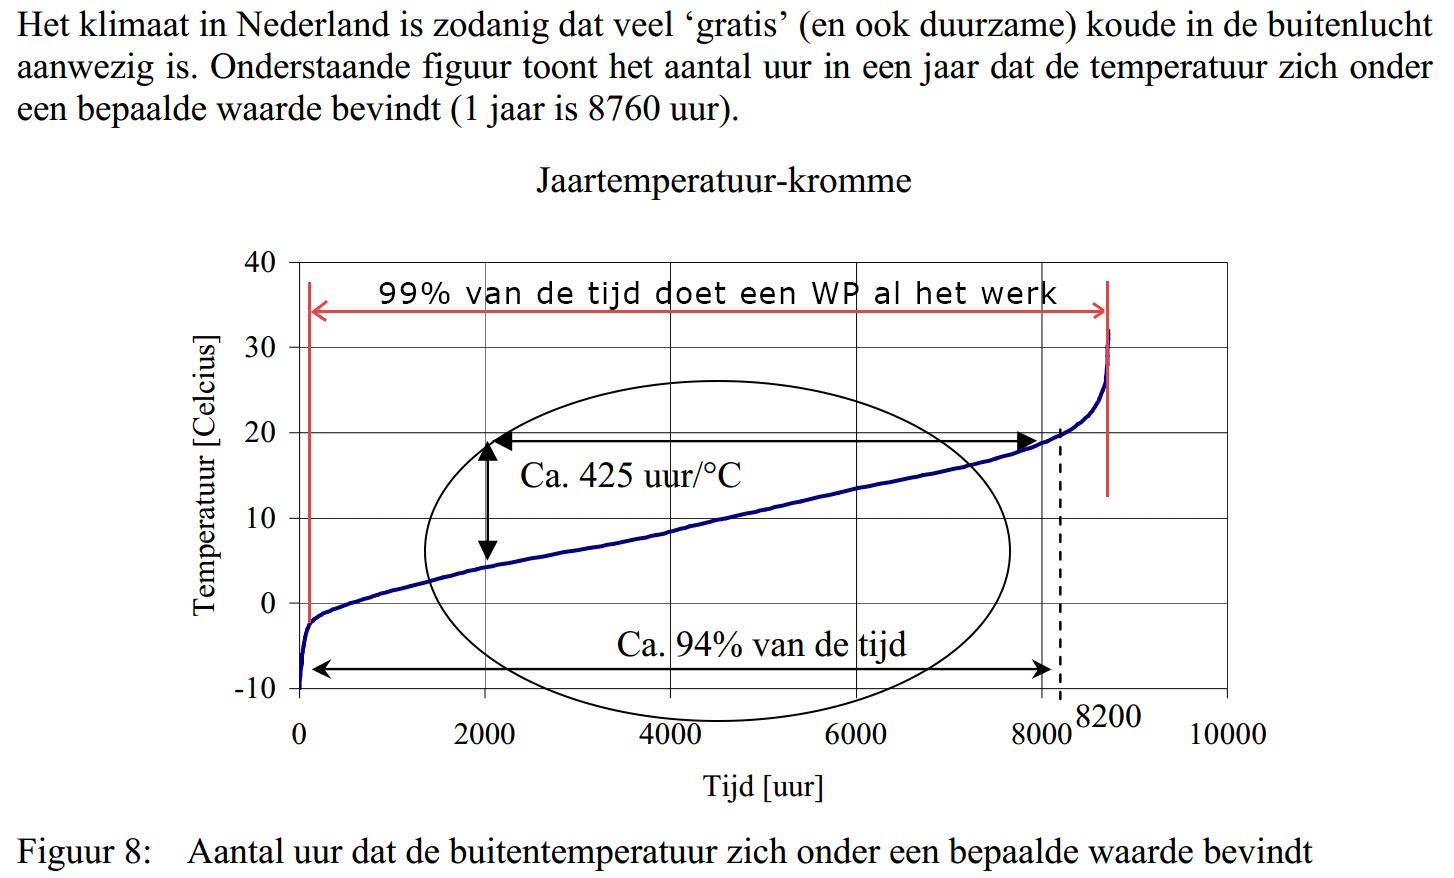 https://img.warmtecheck.nl/WP-bereik-weer.png